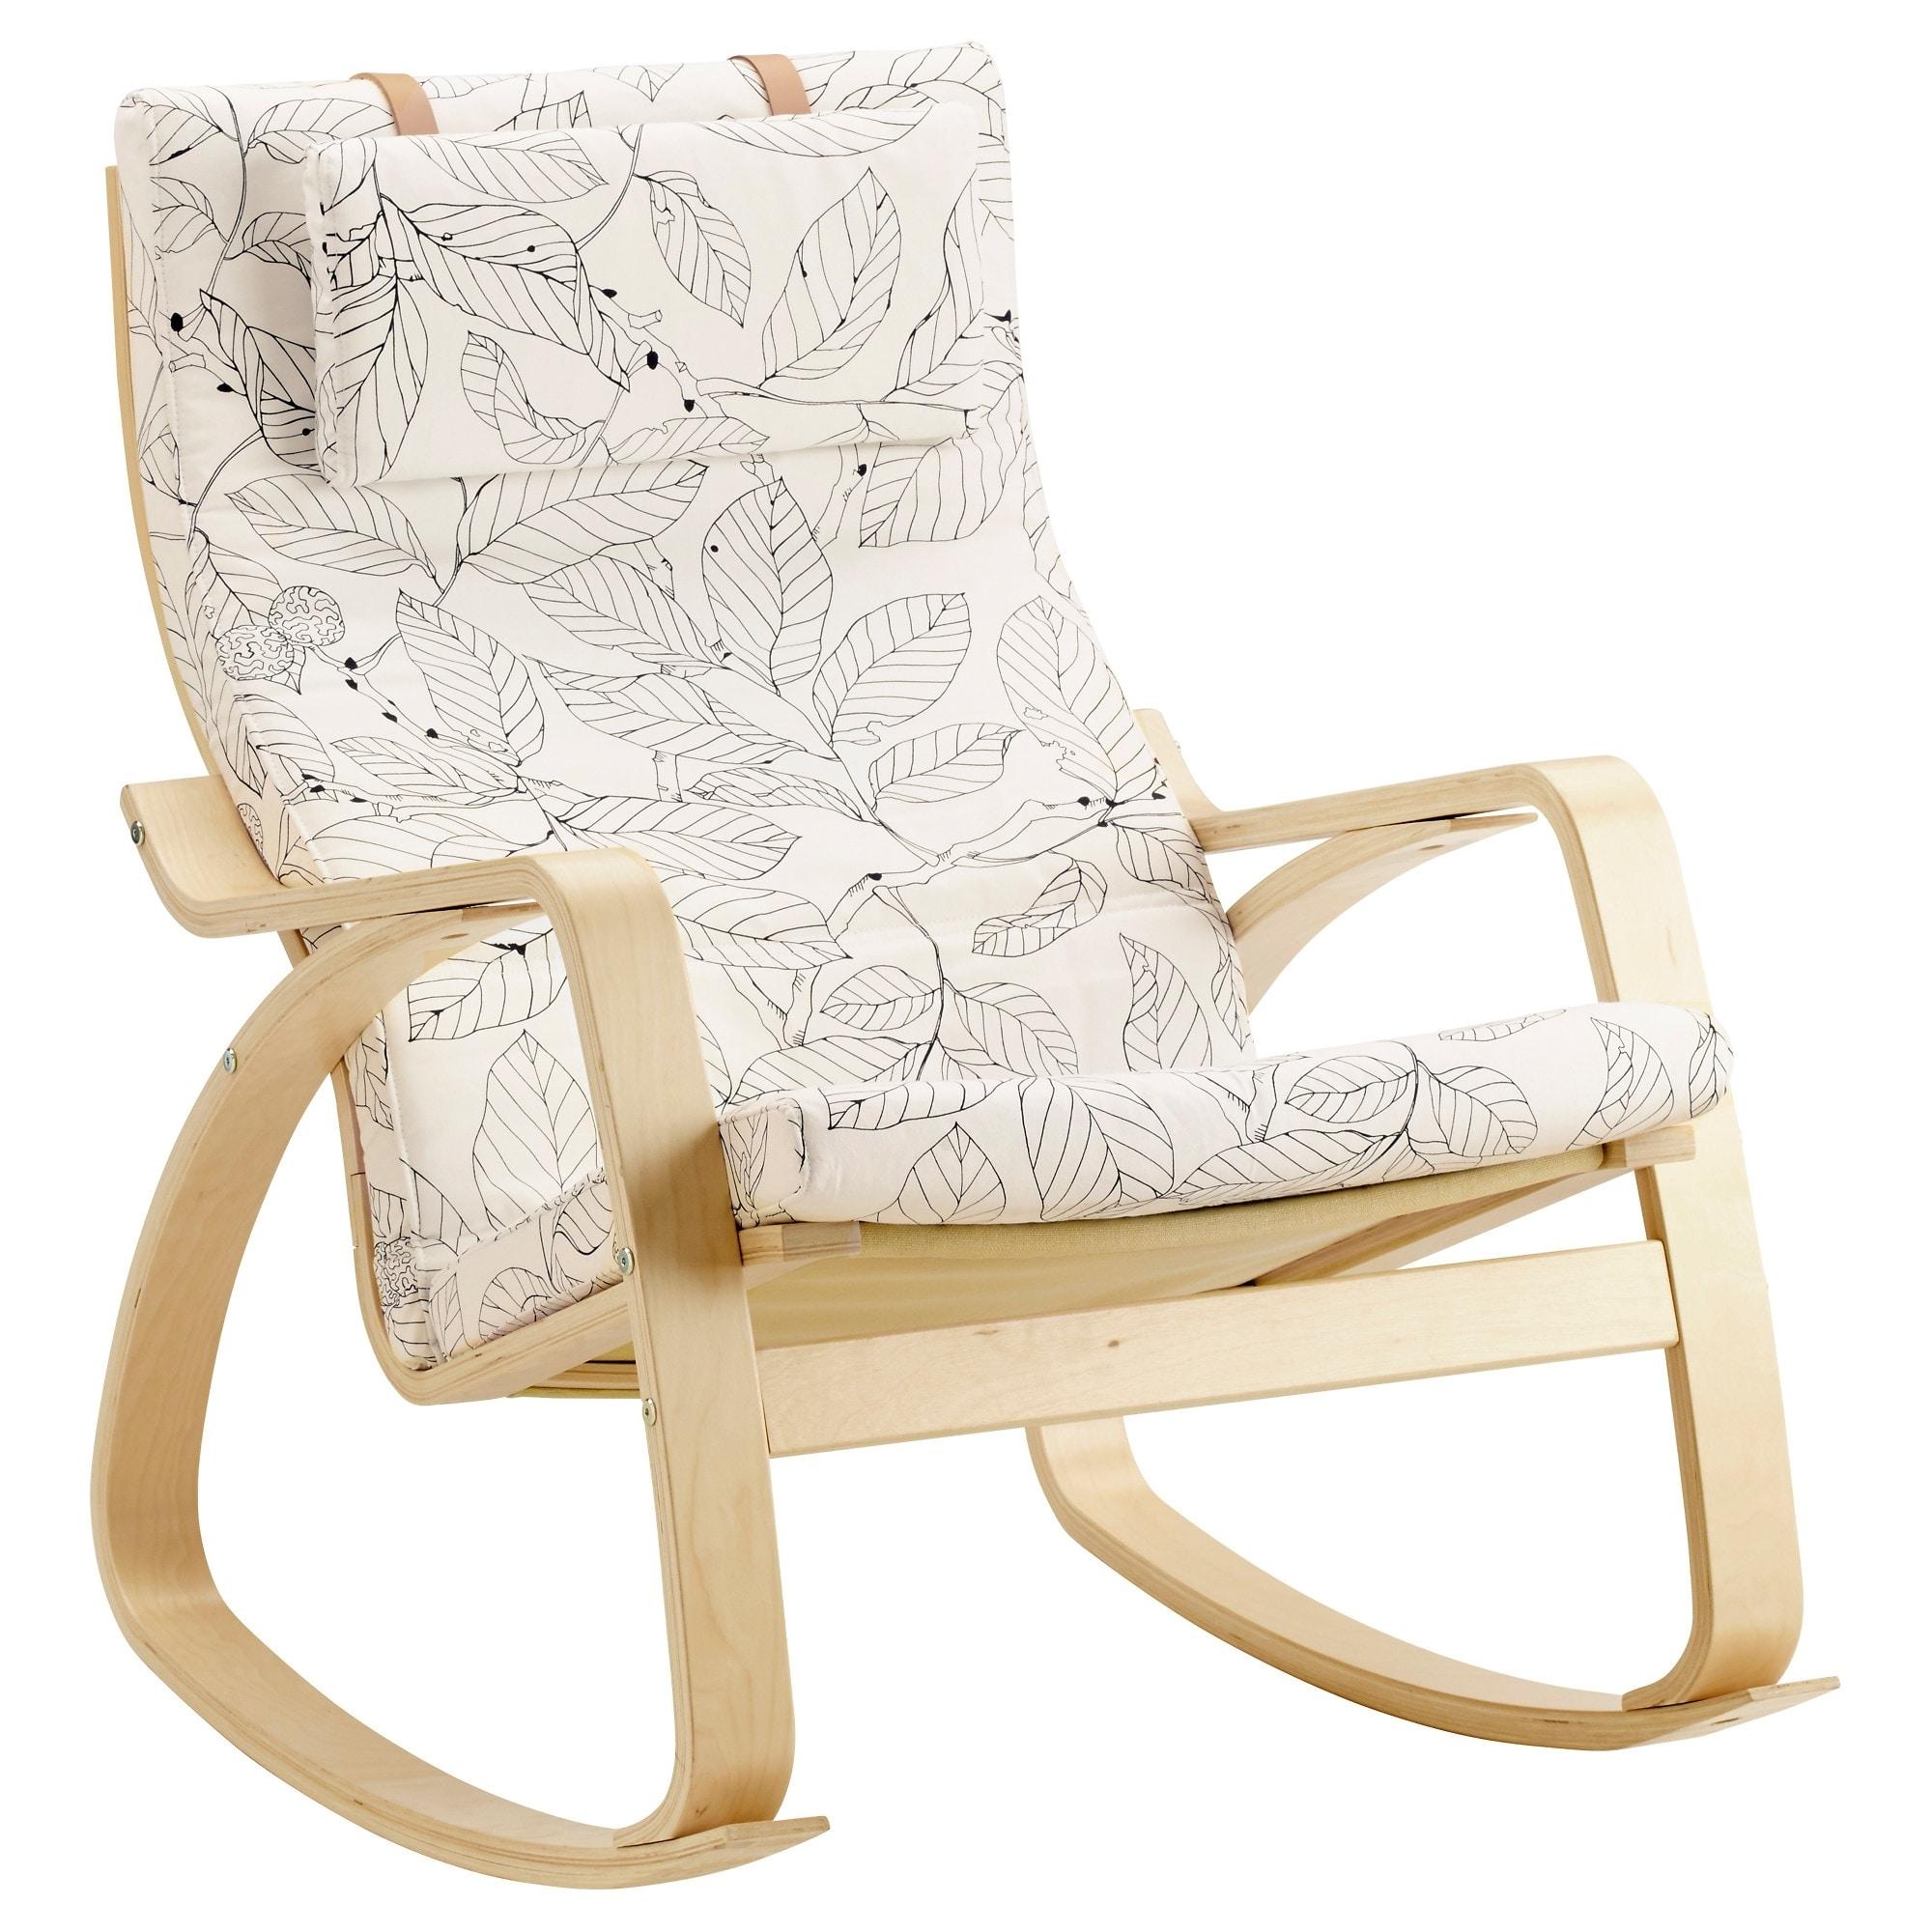 Rocking Chairs Adelaide Regarding 2018 Poäng Rocking Chair – Knisa Red/orange – Ikea (View 7 of 15)